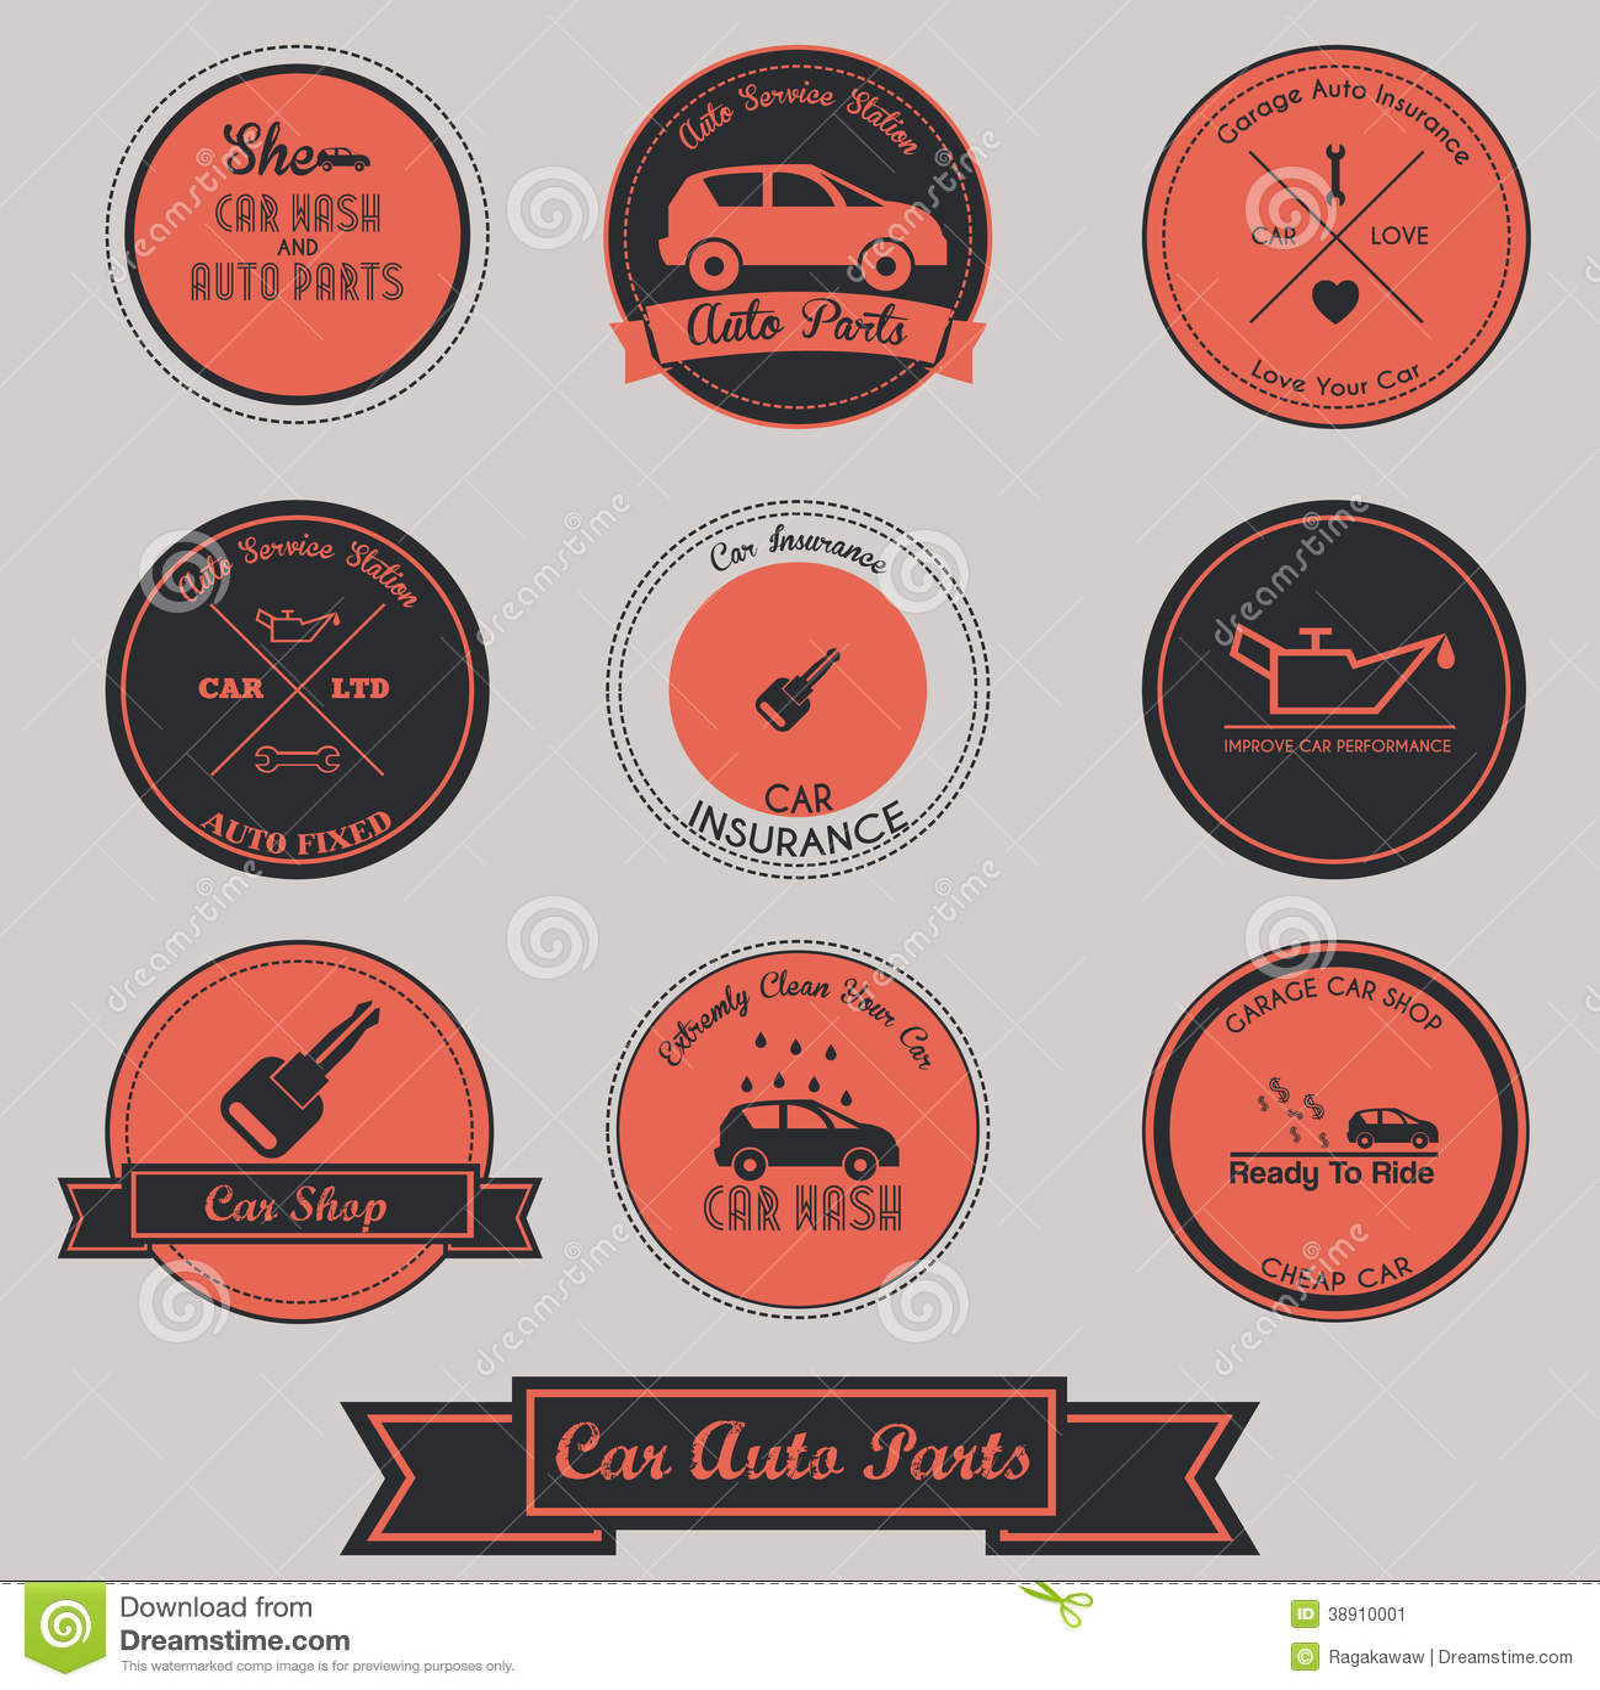 Car Auto Parts Vintage Label Design Stock Vector Illustration Of